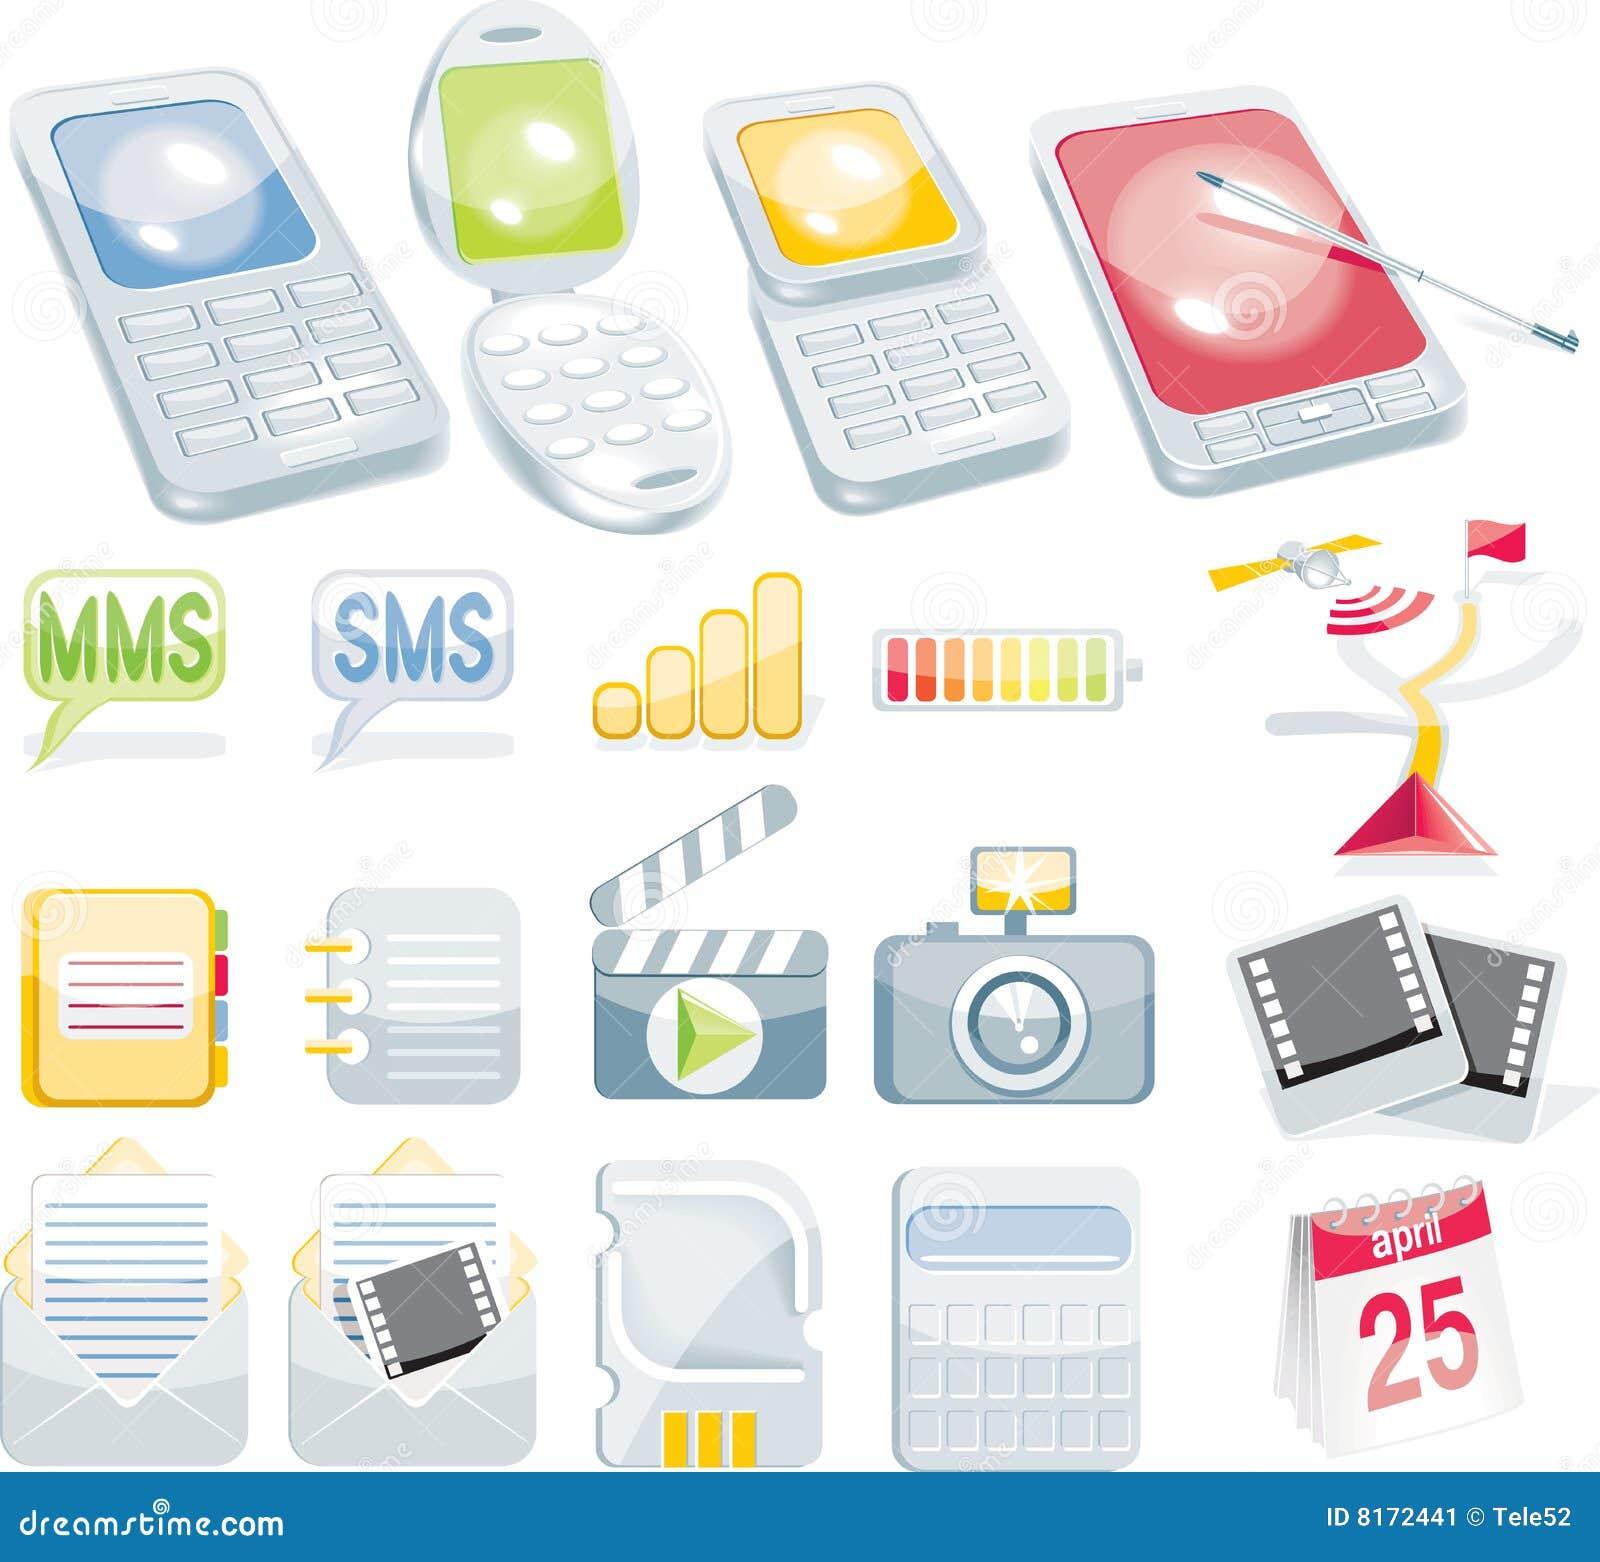 Conjunto celular del icono